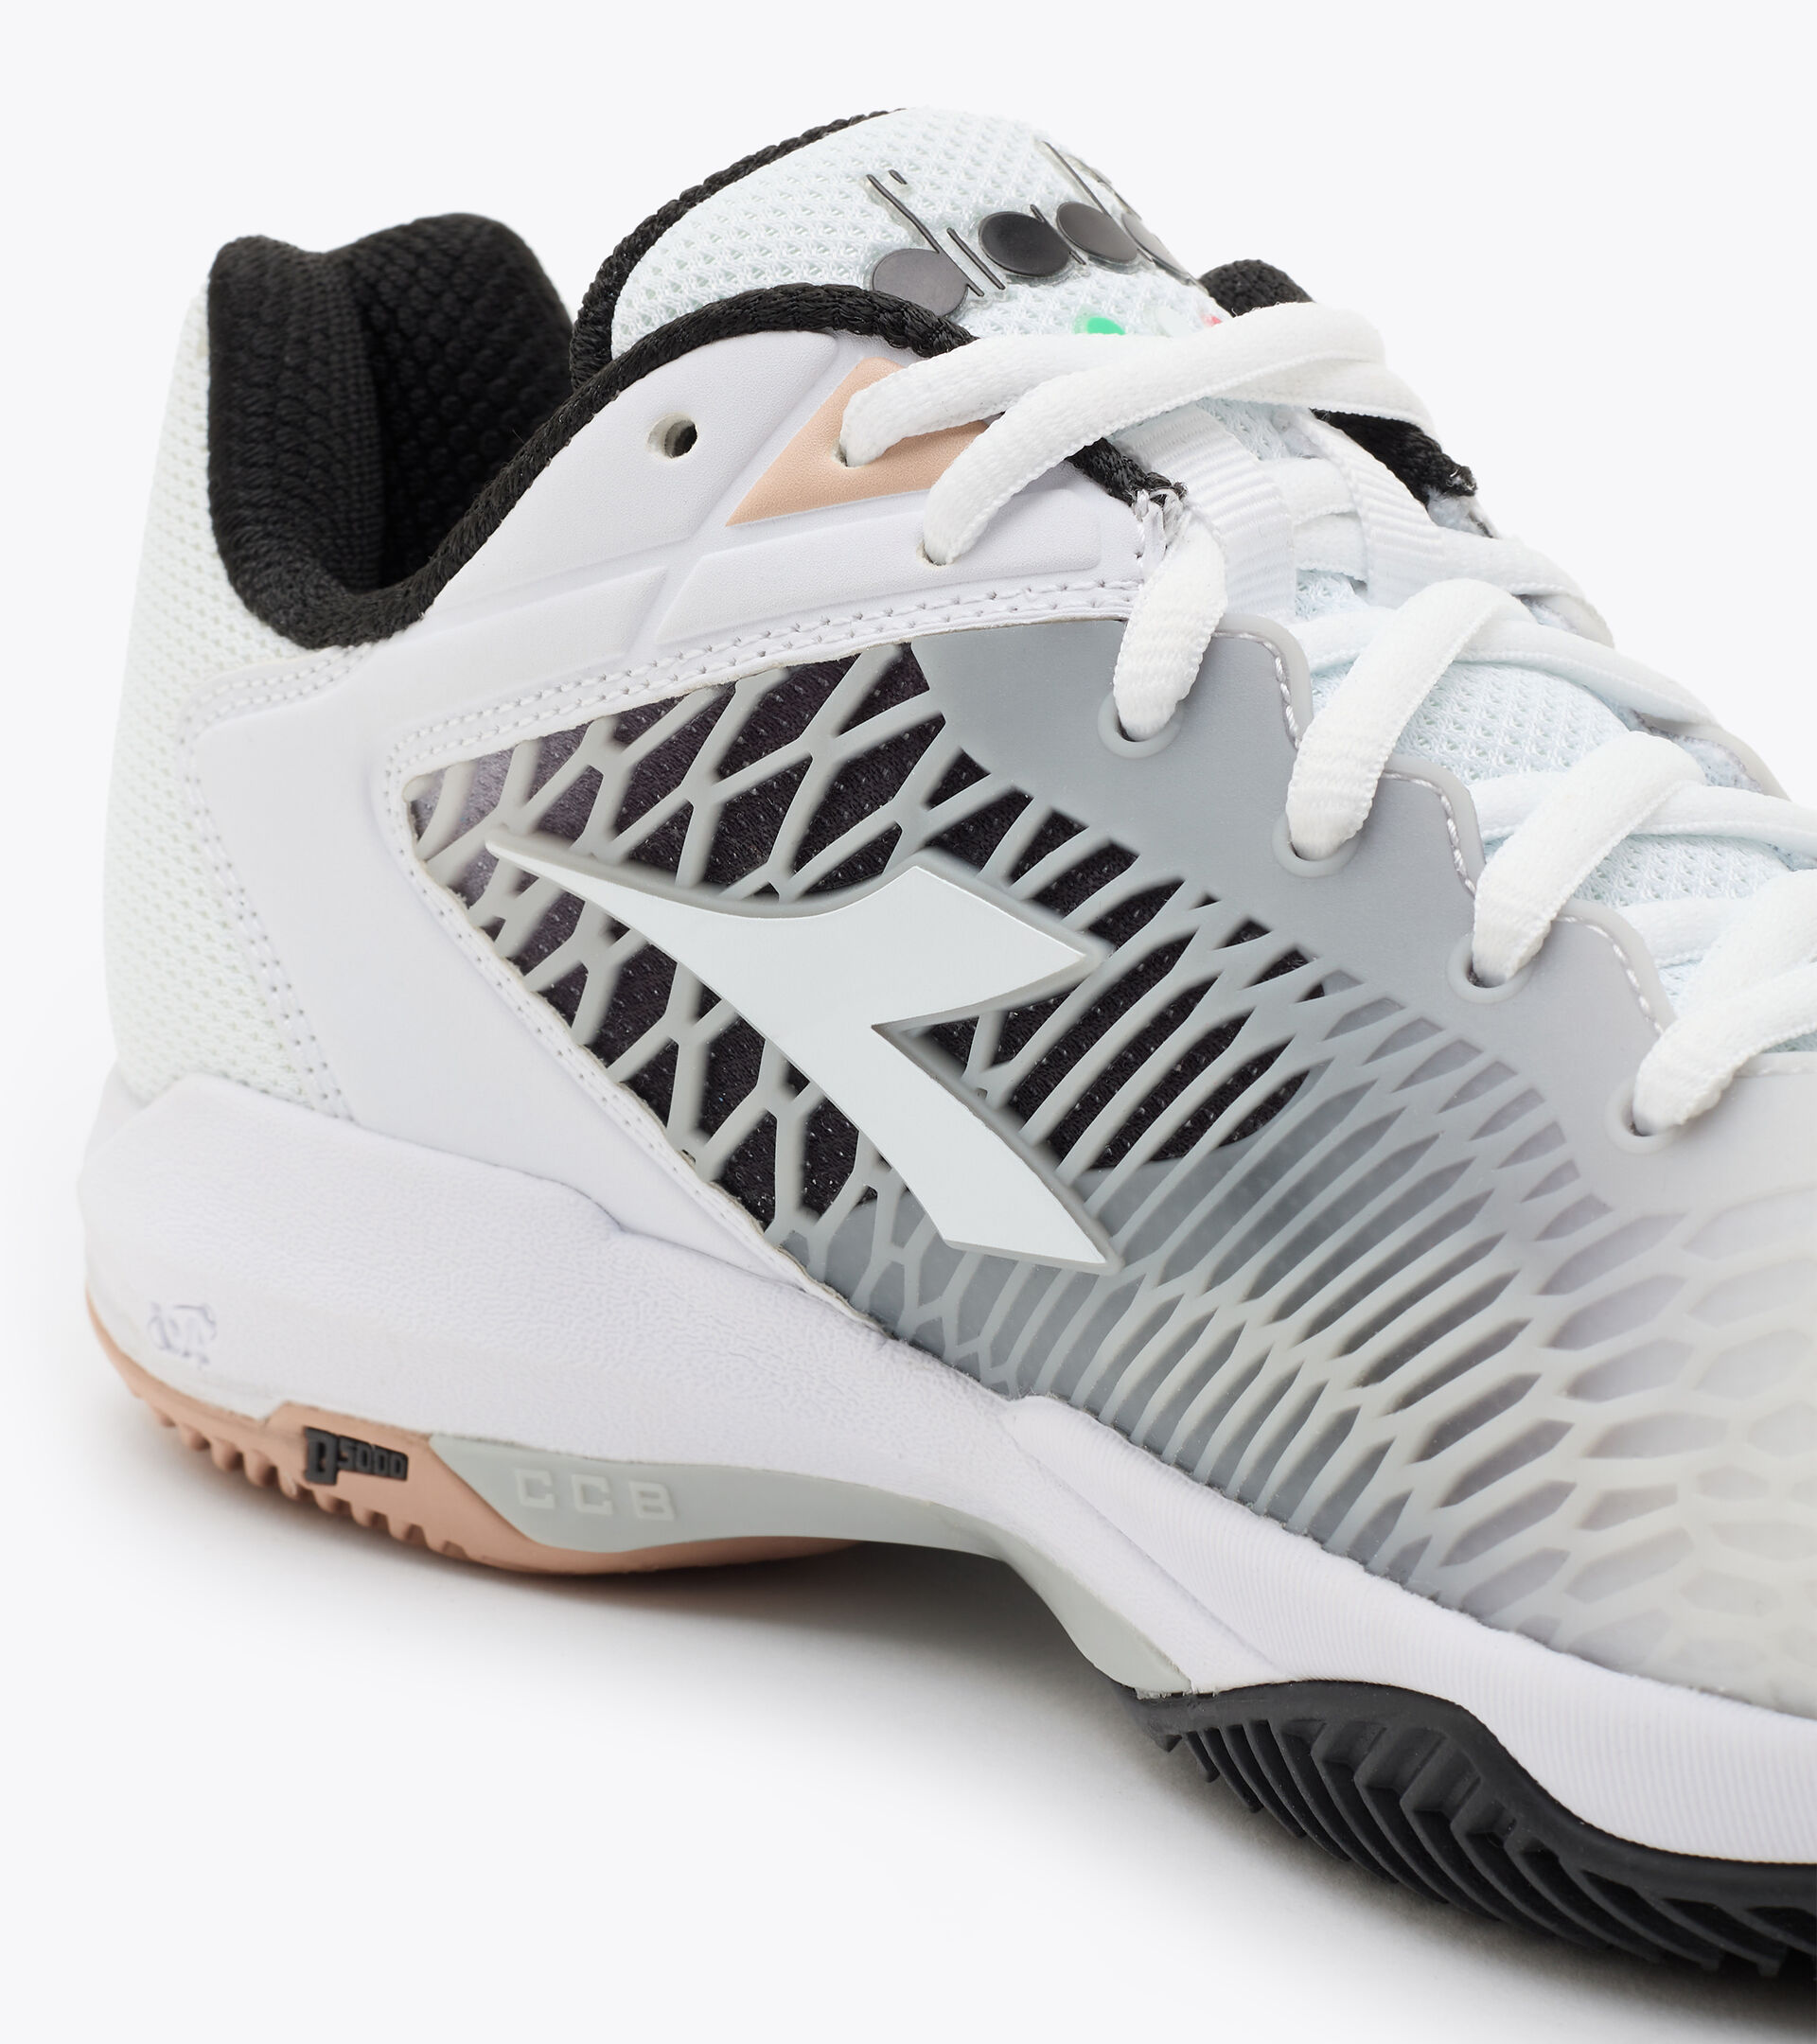 Footwear Sport DONNA SPEED COMPETITION 6 + W CLAY BIANCO OTTICO/ARGENTO/NERO Diadora